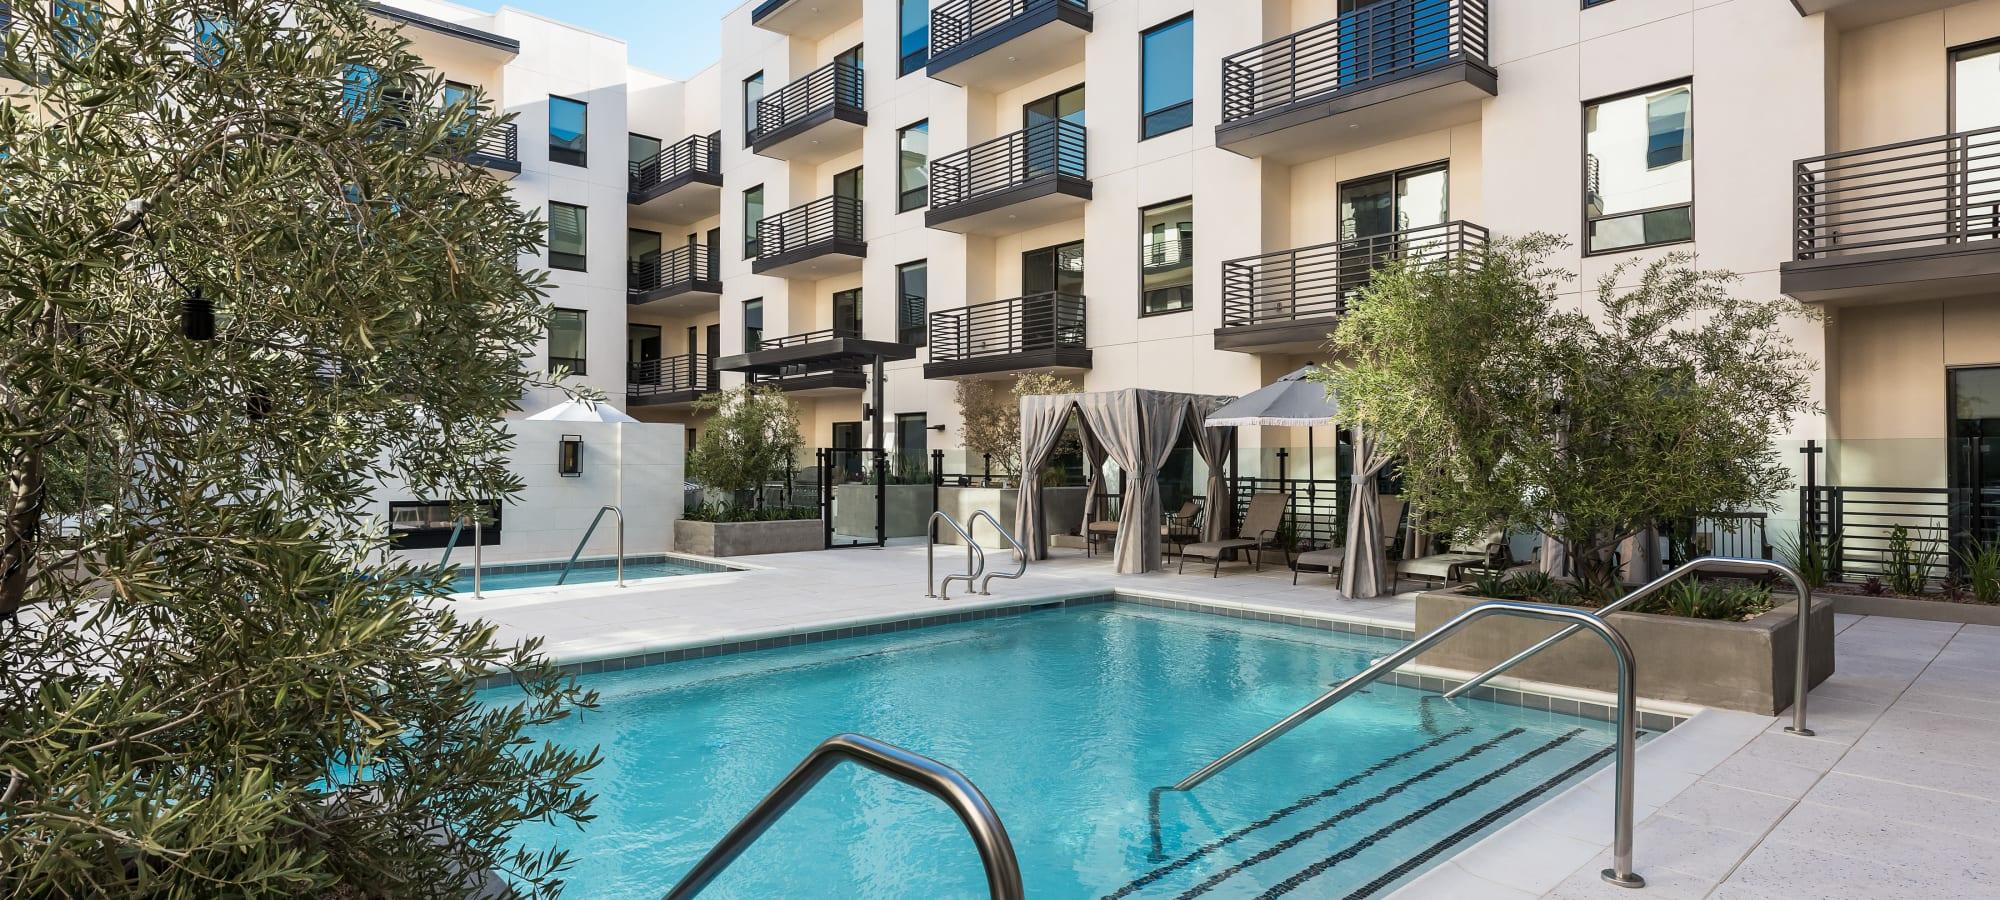 Stunning pool area at Gramercy Scottsdale in Scottsdale, Arizona